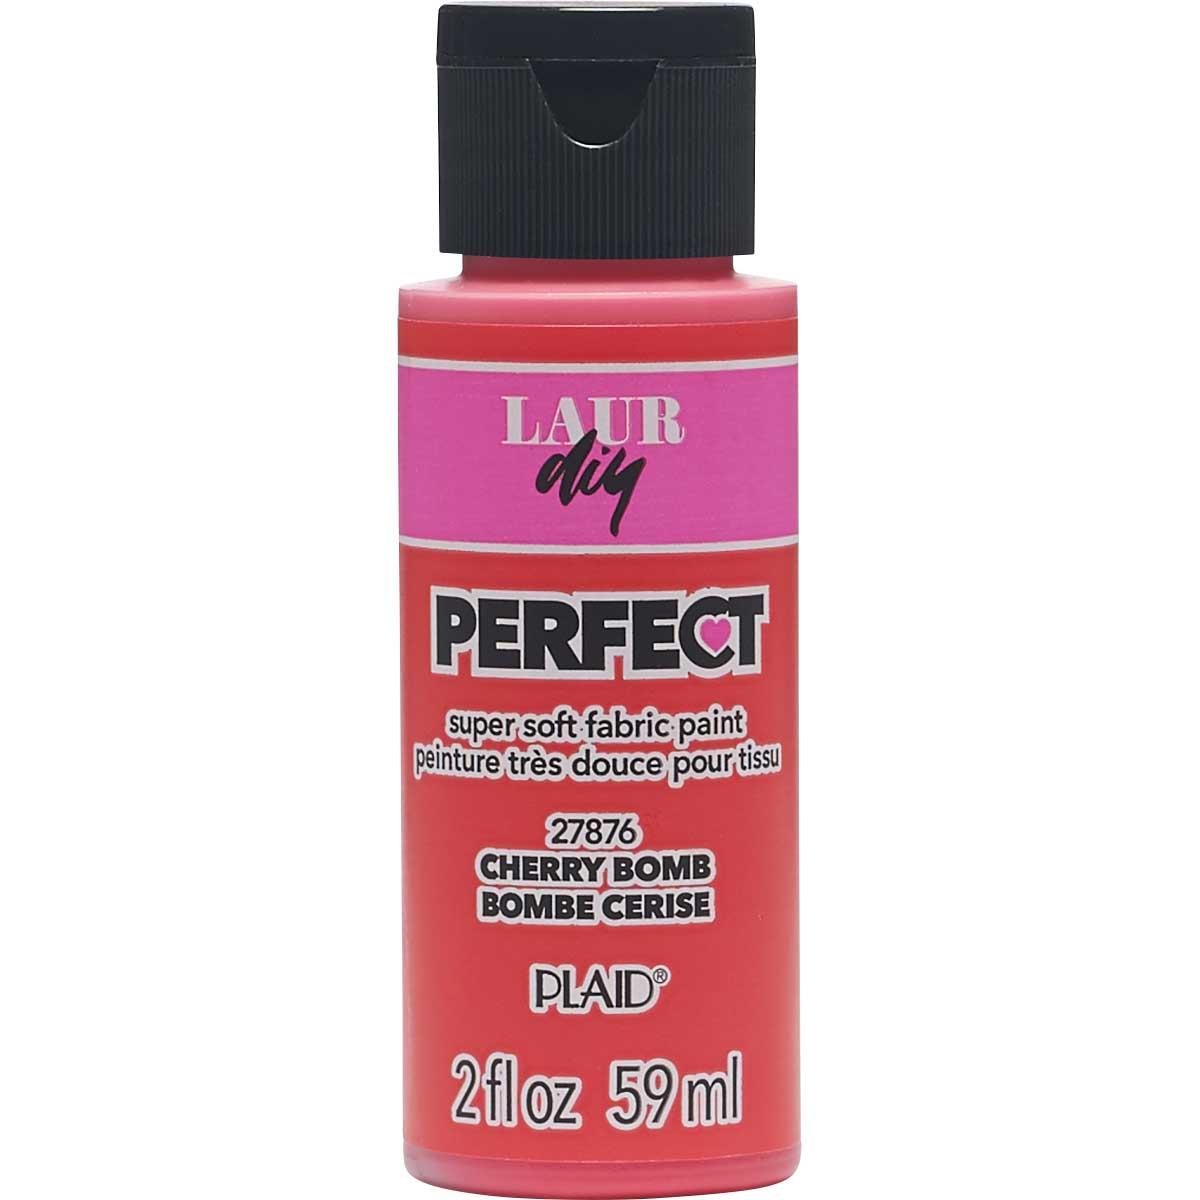 LaurDIY ® Perfect Fabric Paint - Cherry Bomb, 2 oz.